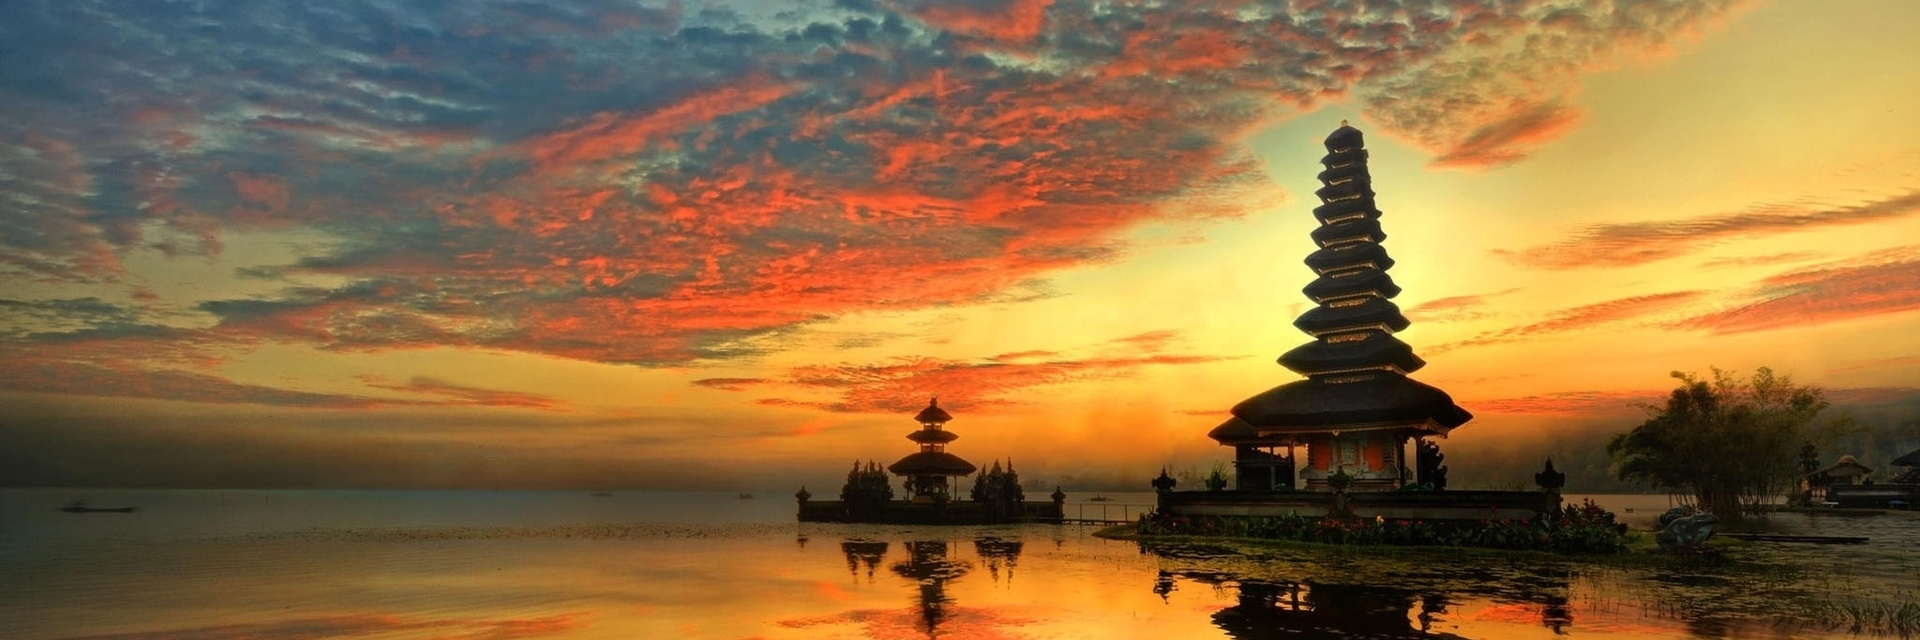 https://gody.vn/blog/hellyng12124416/post/du-lich-indonesia-7-ngay-tu-tuc-2331